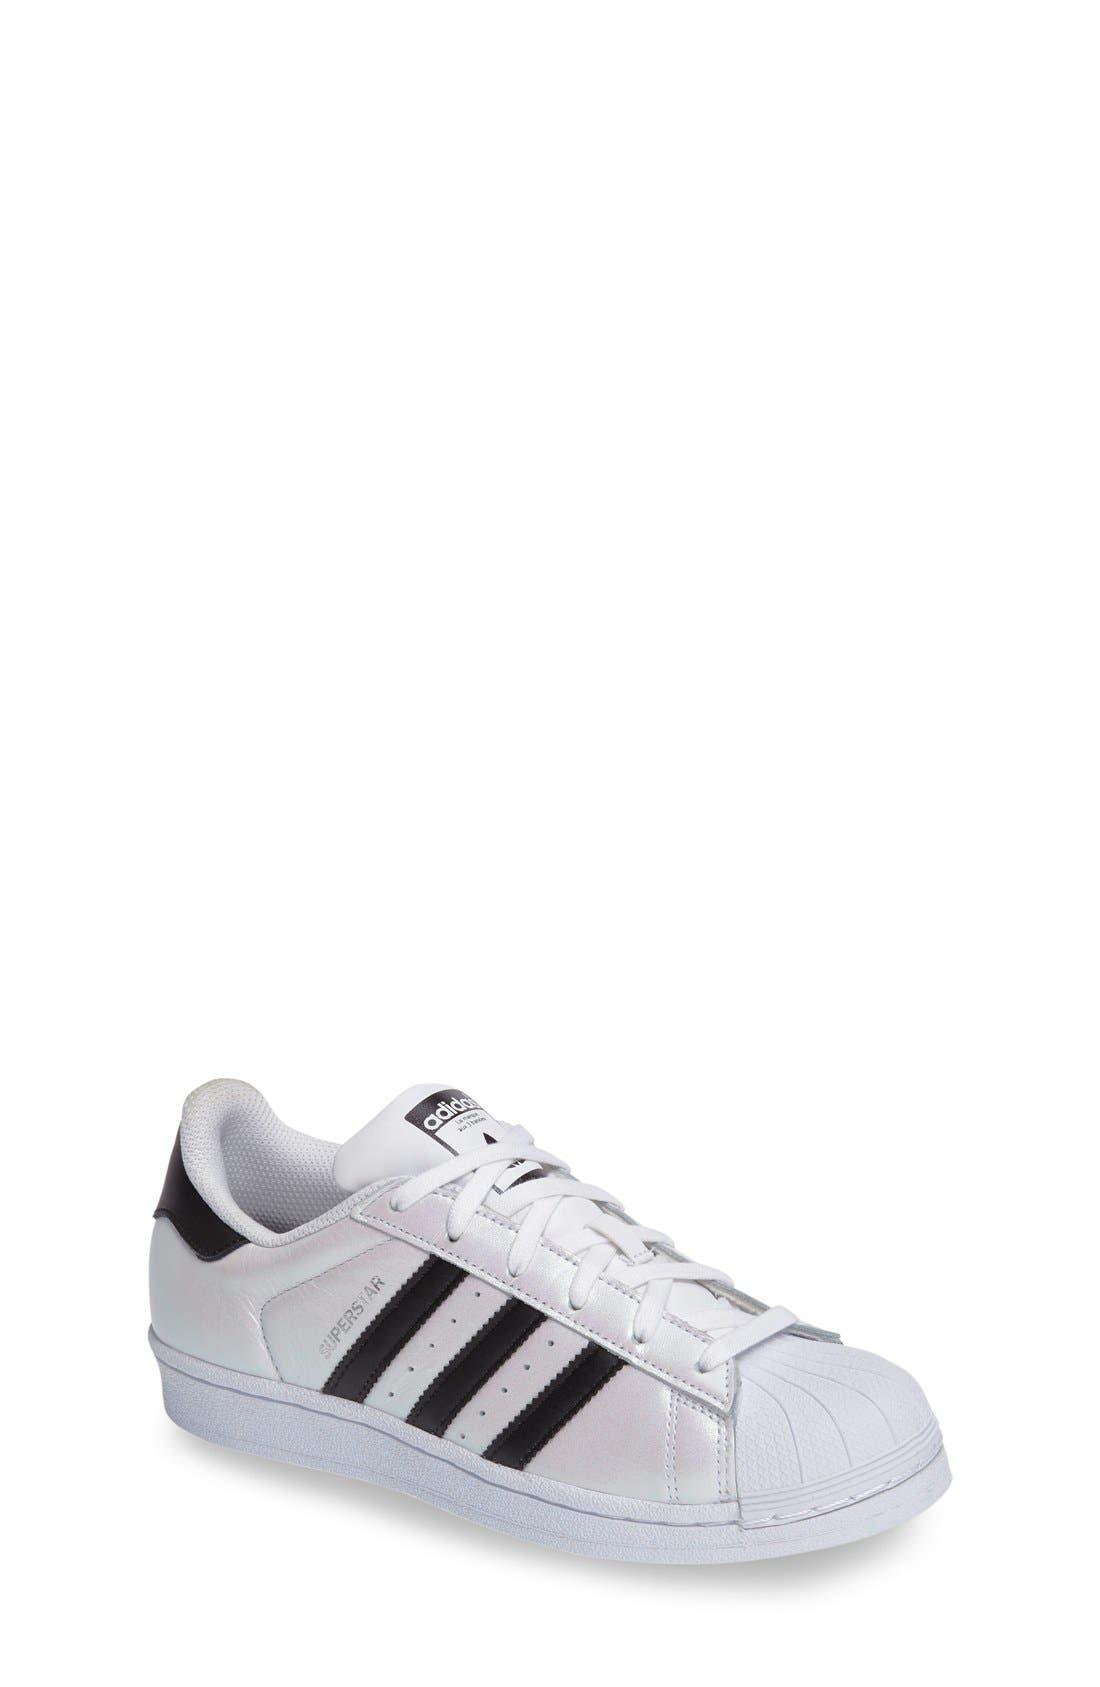 Main Image - adidas Superstar Metallic Sneaker